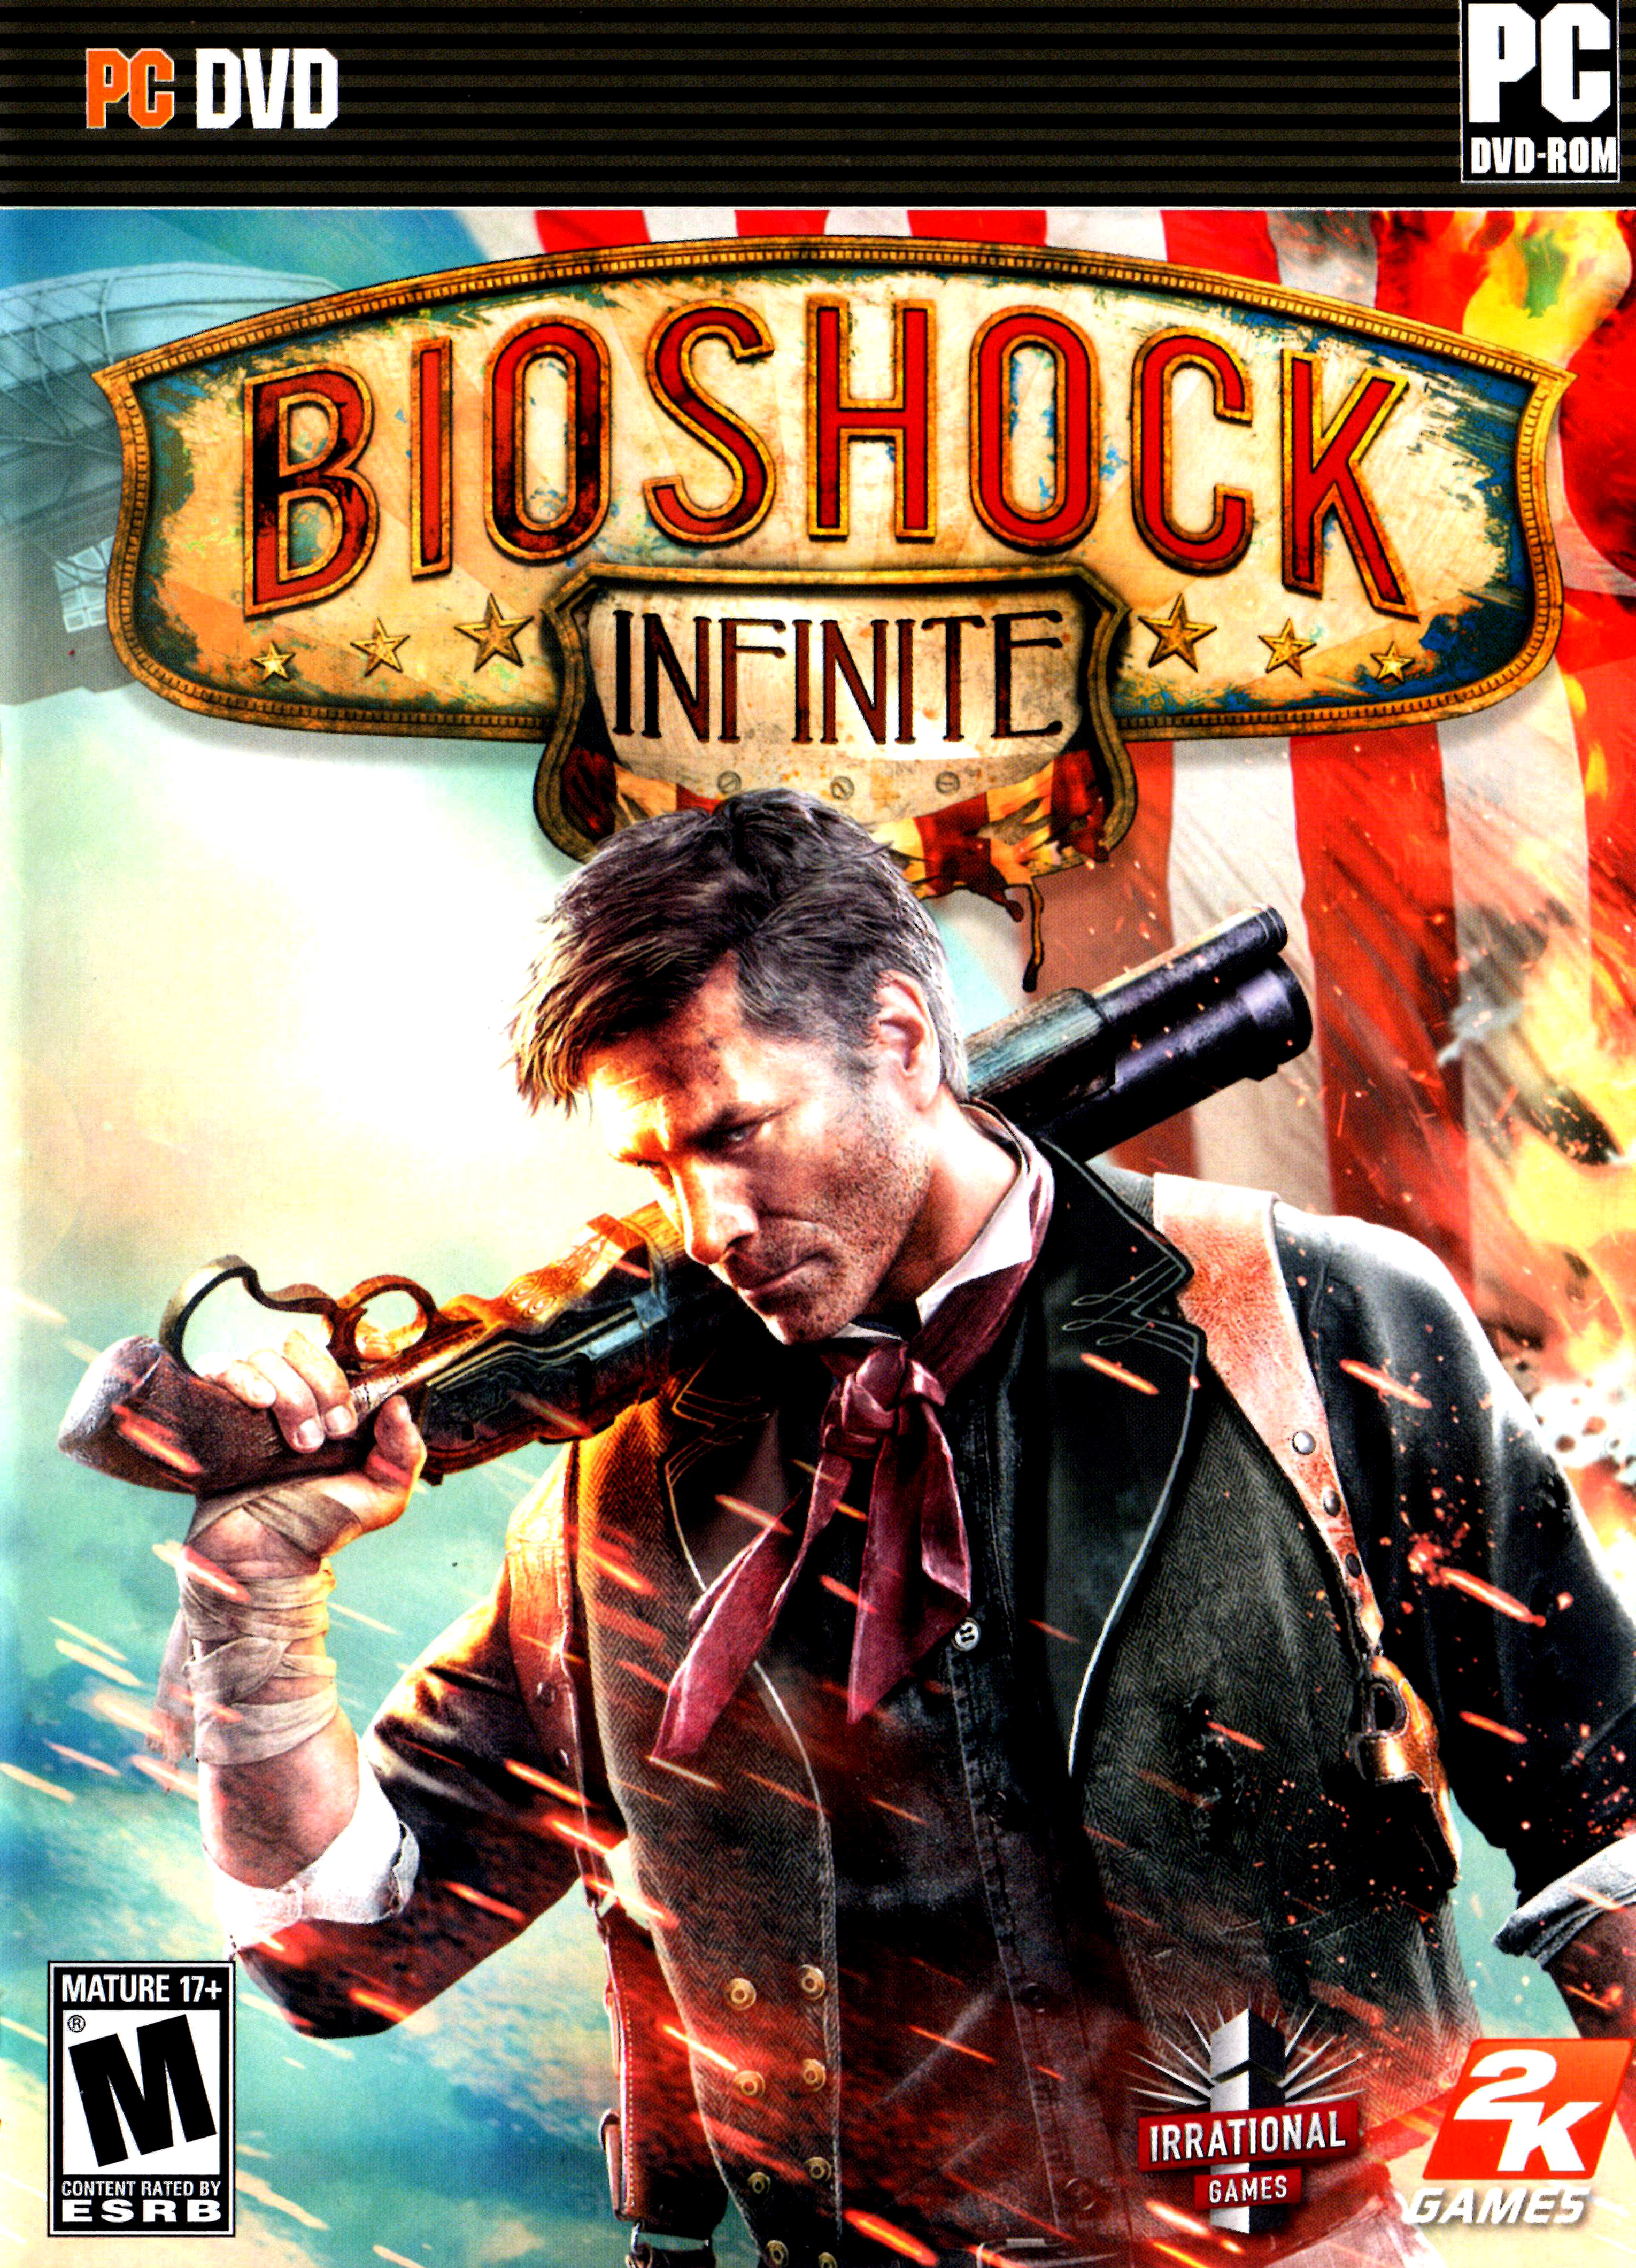 Bioshock Infinite - Rating and User Reviews | GAMERS DECIDE